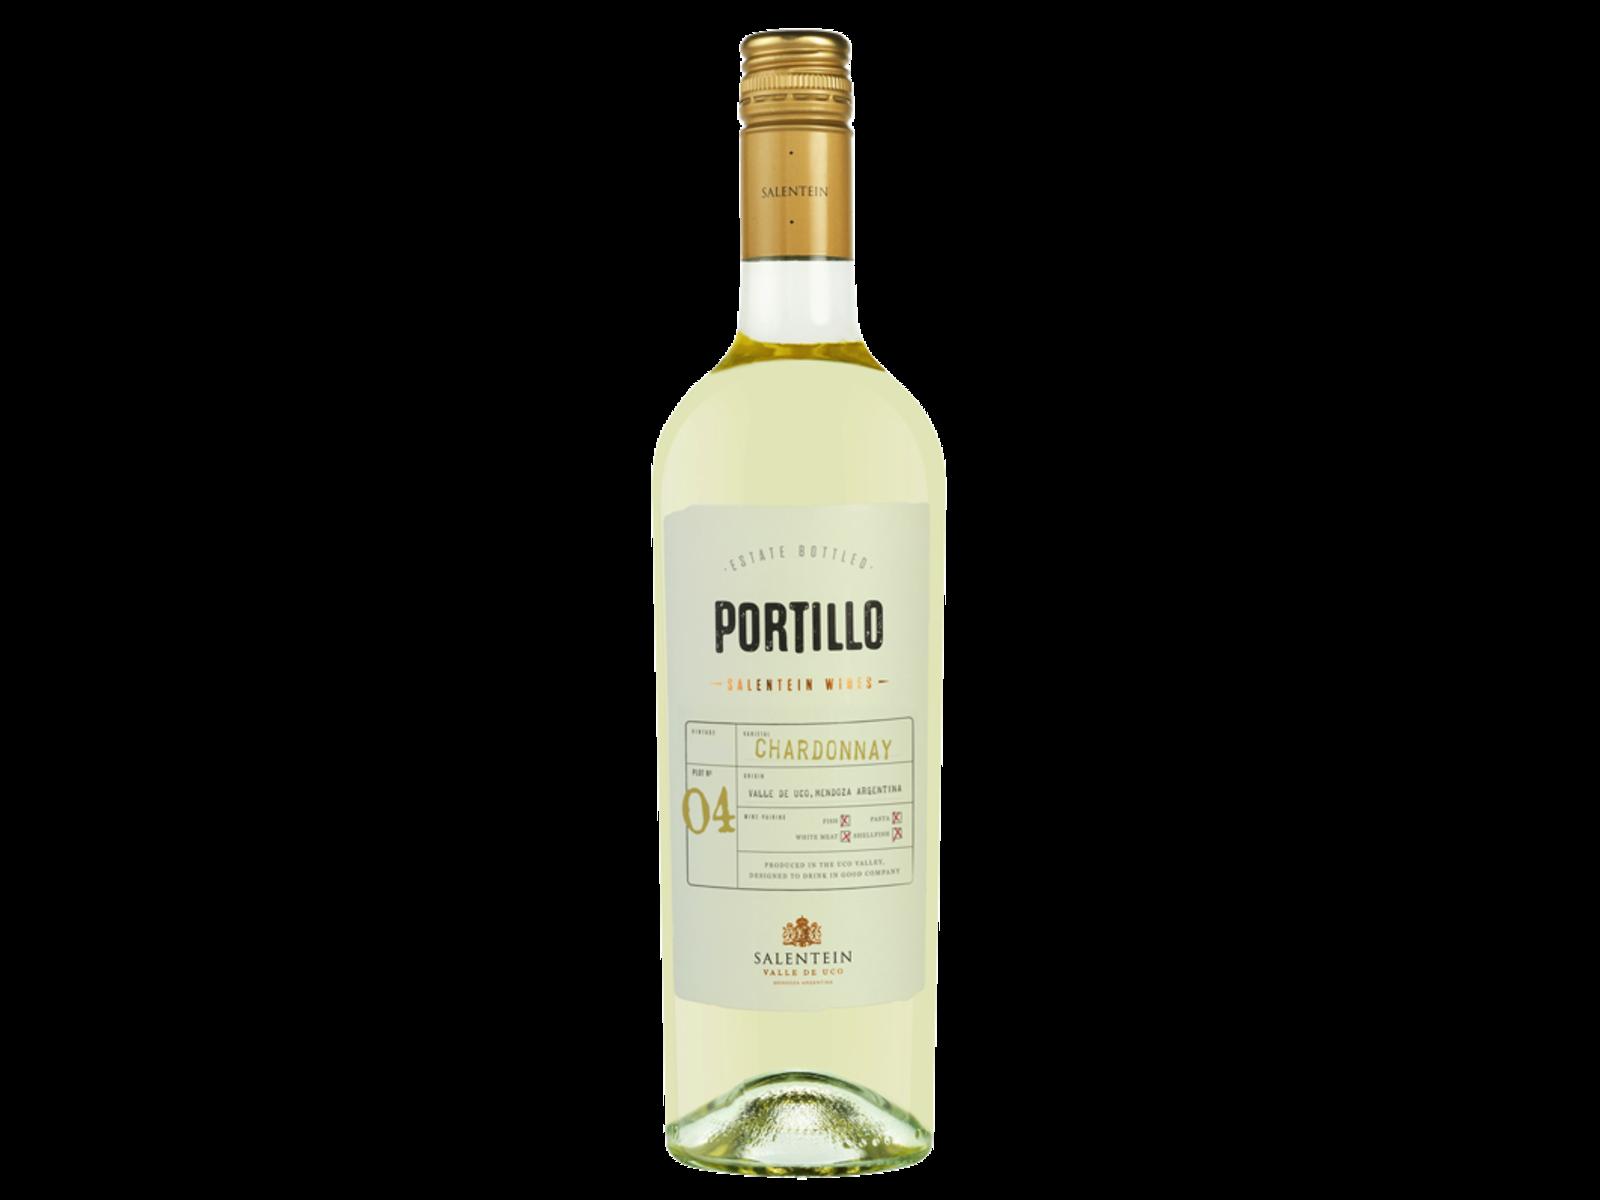 Bodegas Salentein Portillo Chardonnay